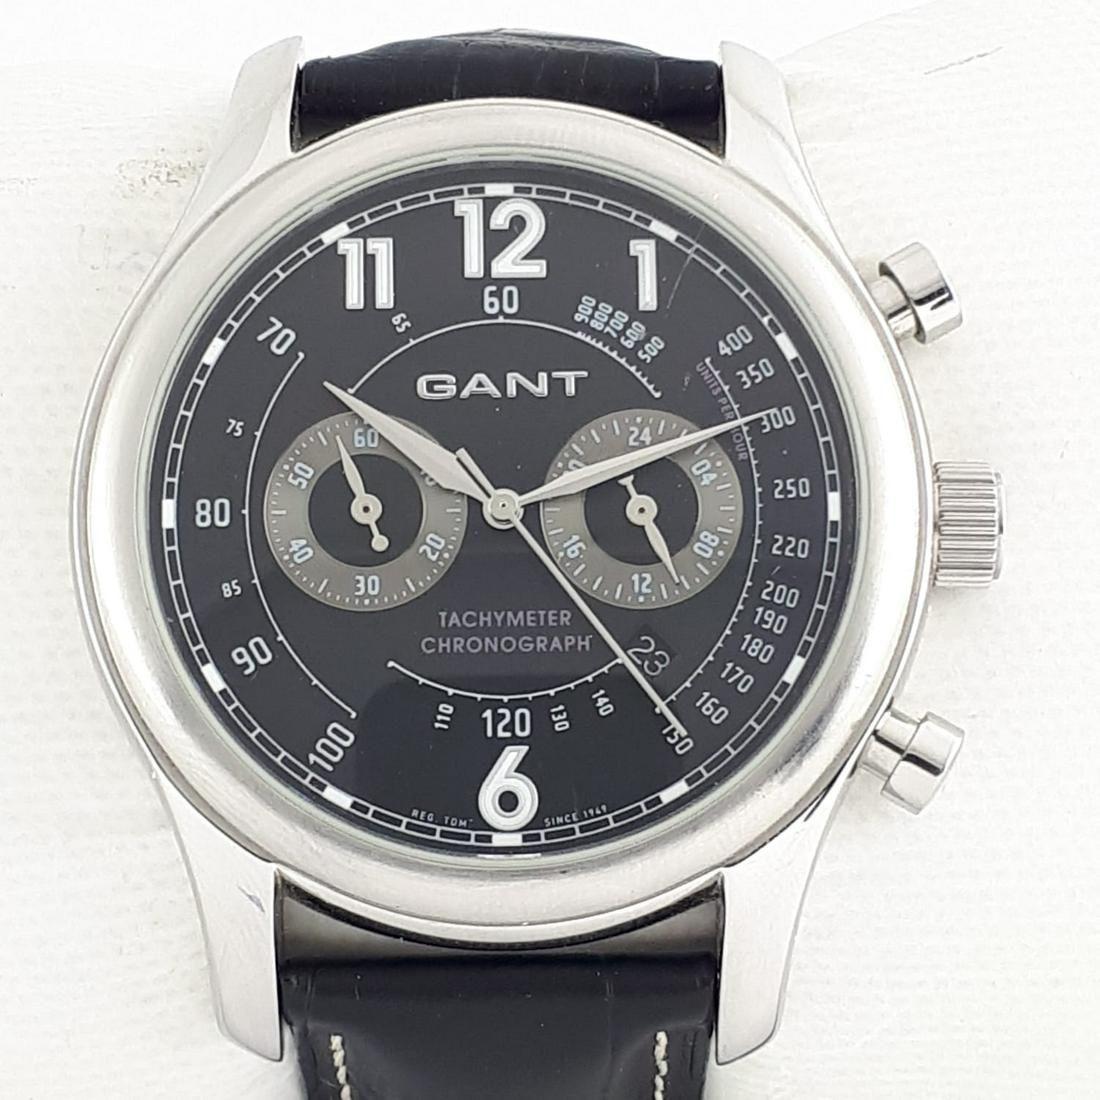 GANT - Tachymeter Chronograph - Men - 2011-present